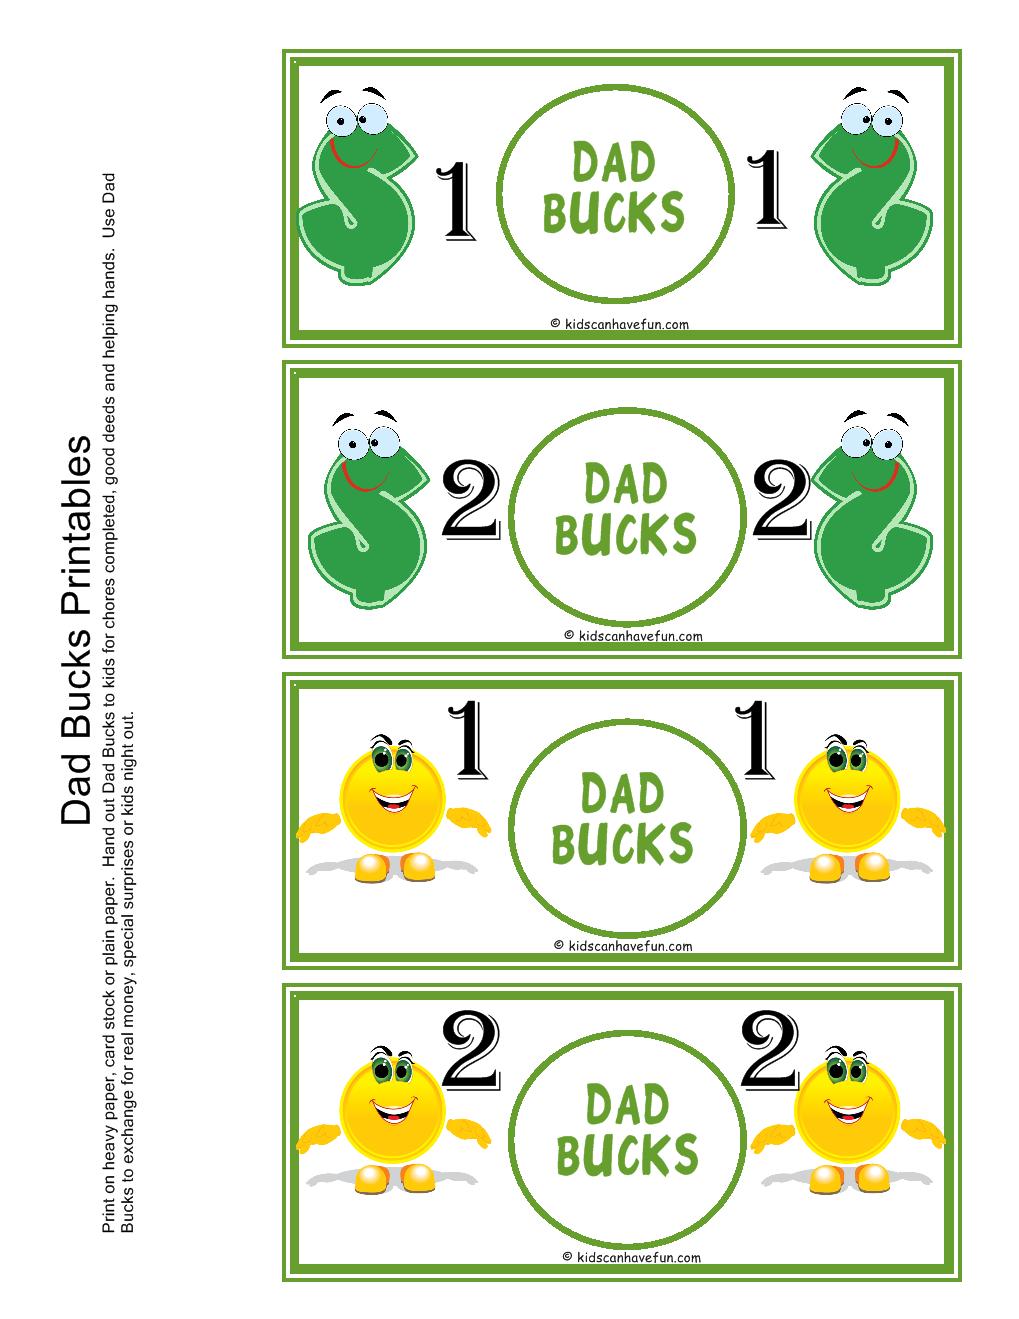 Dad bucks reward money pretend play playtime for Classroom bucks template